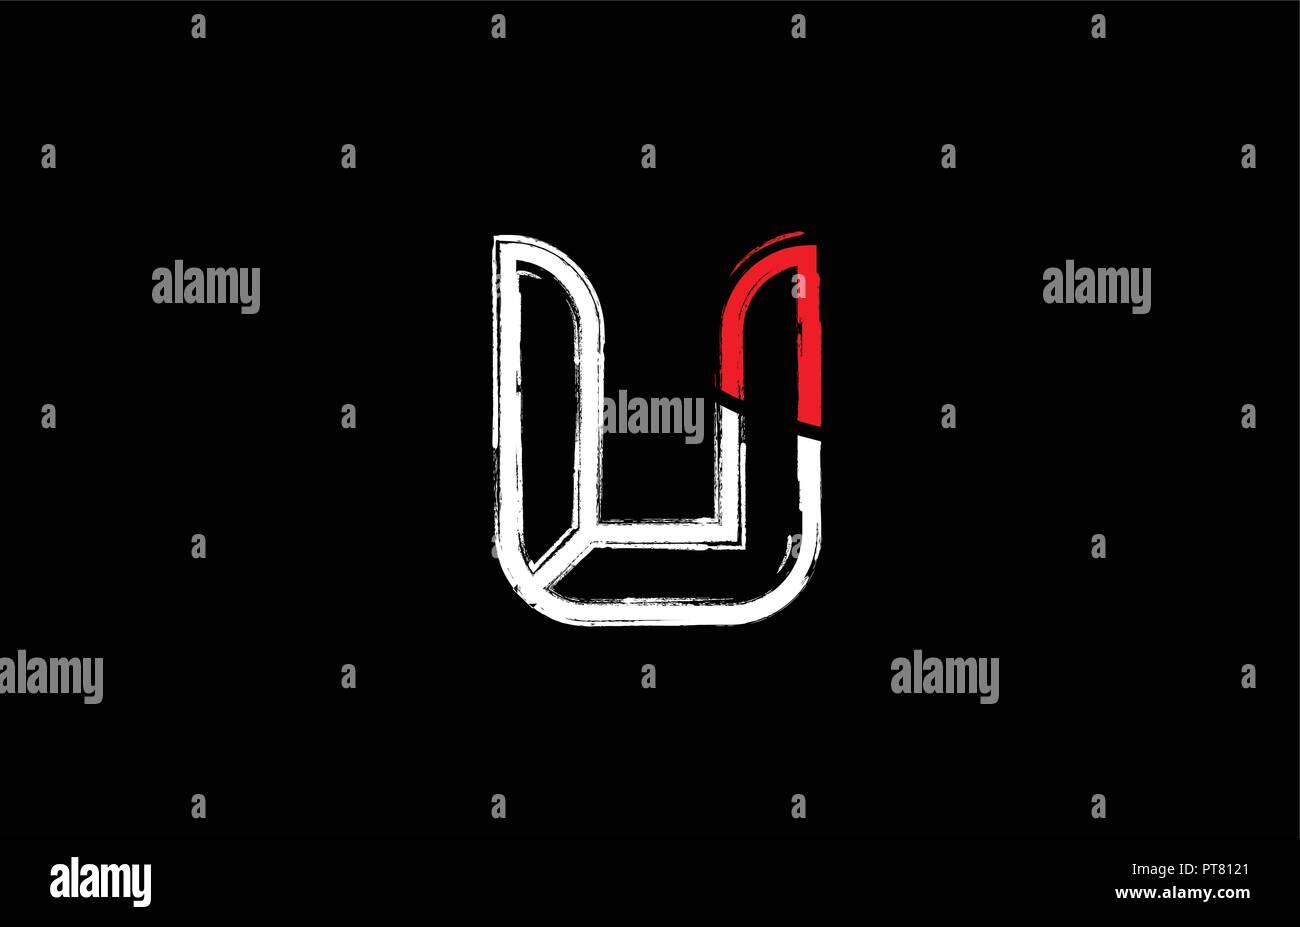 Grunge Alphabet Letter U Logo Design In White Red And Black